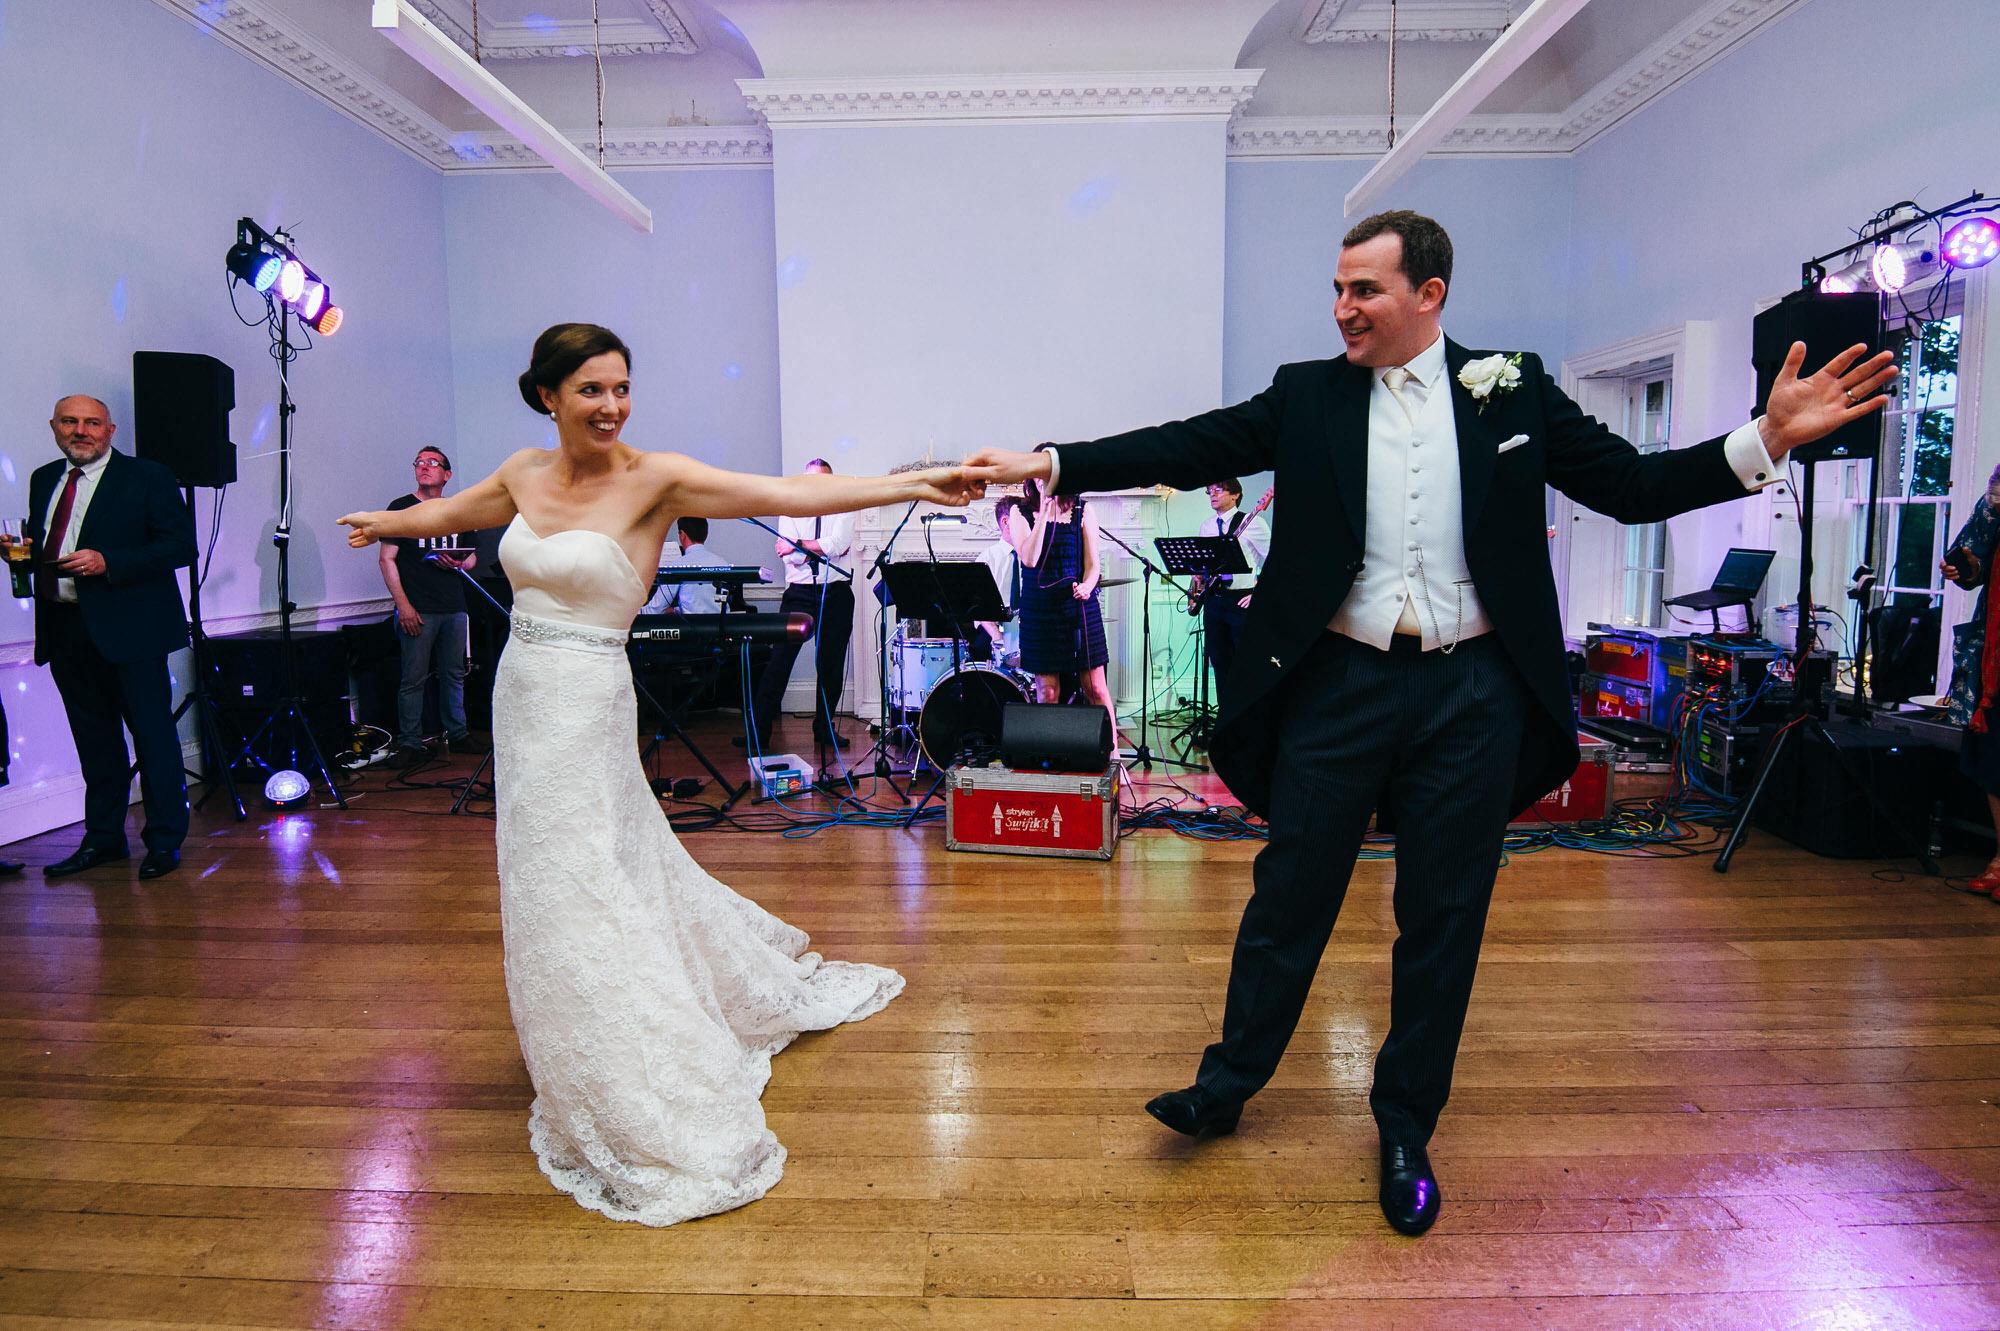 Kingswood school wedding first dance